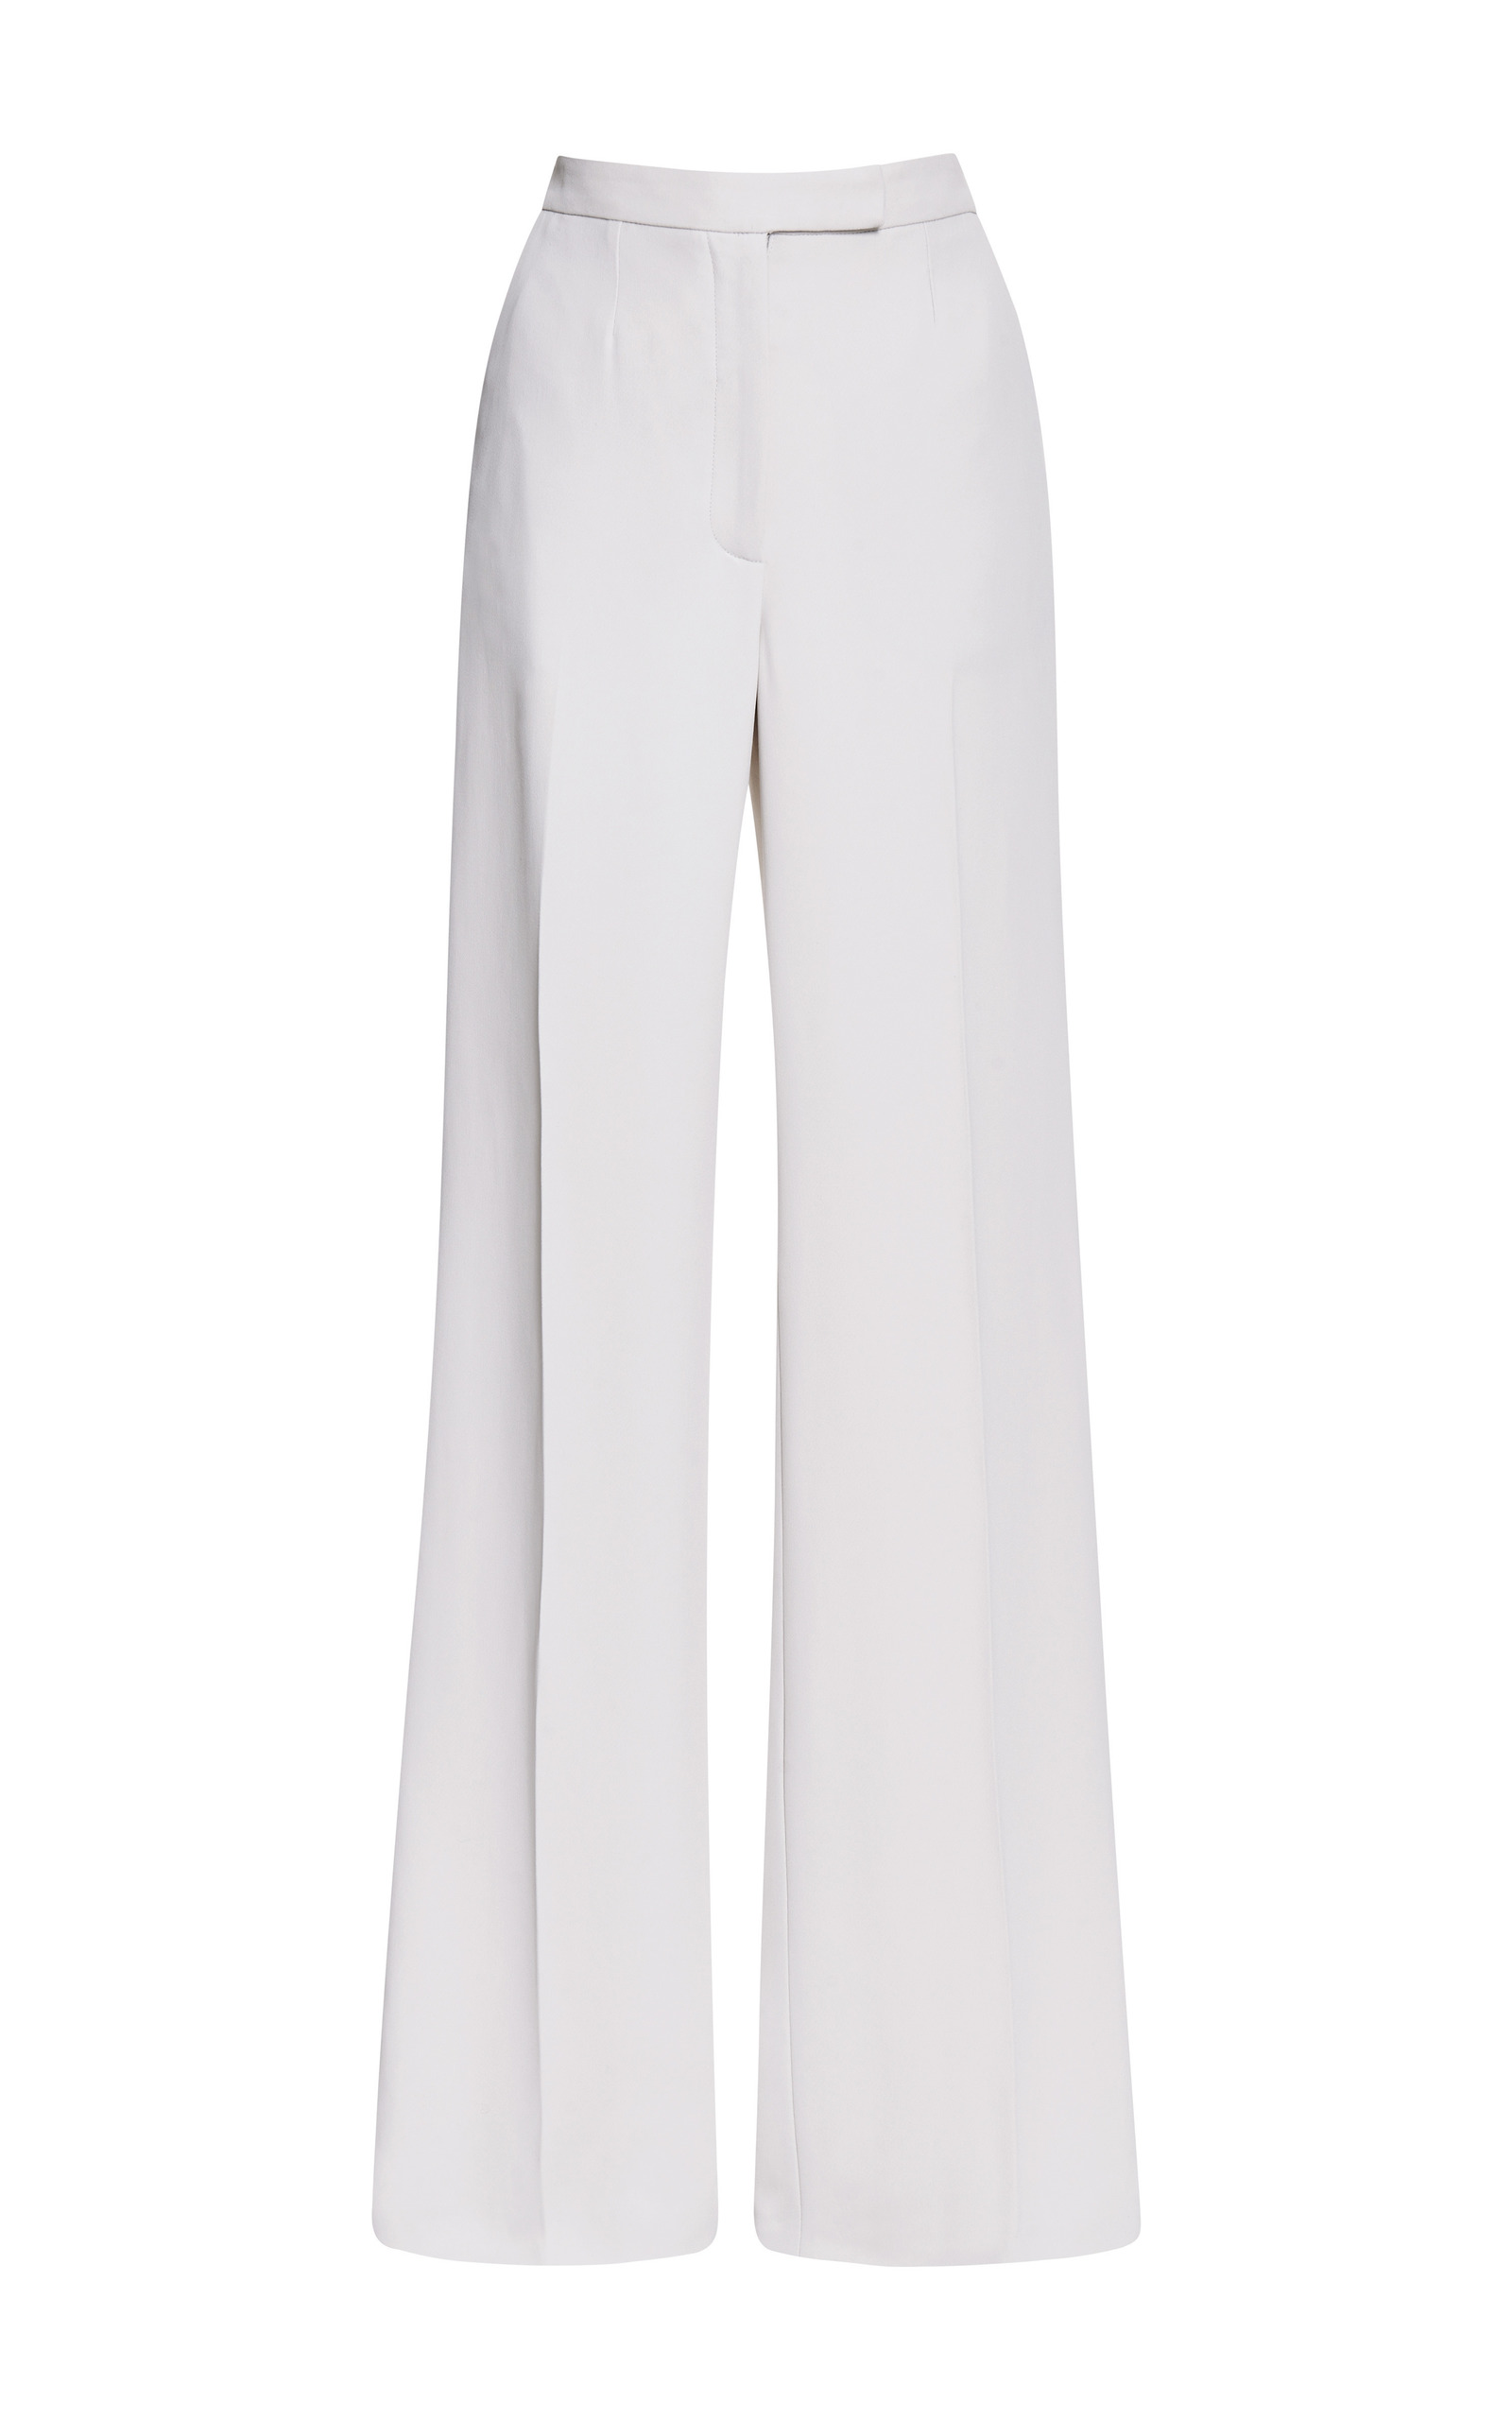 Elie Saab Jasmine Stretch Cady Wide Pant by Elie Saab | Moda Operandi